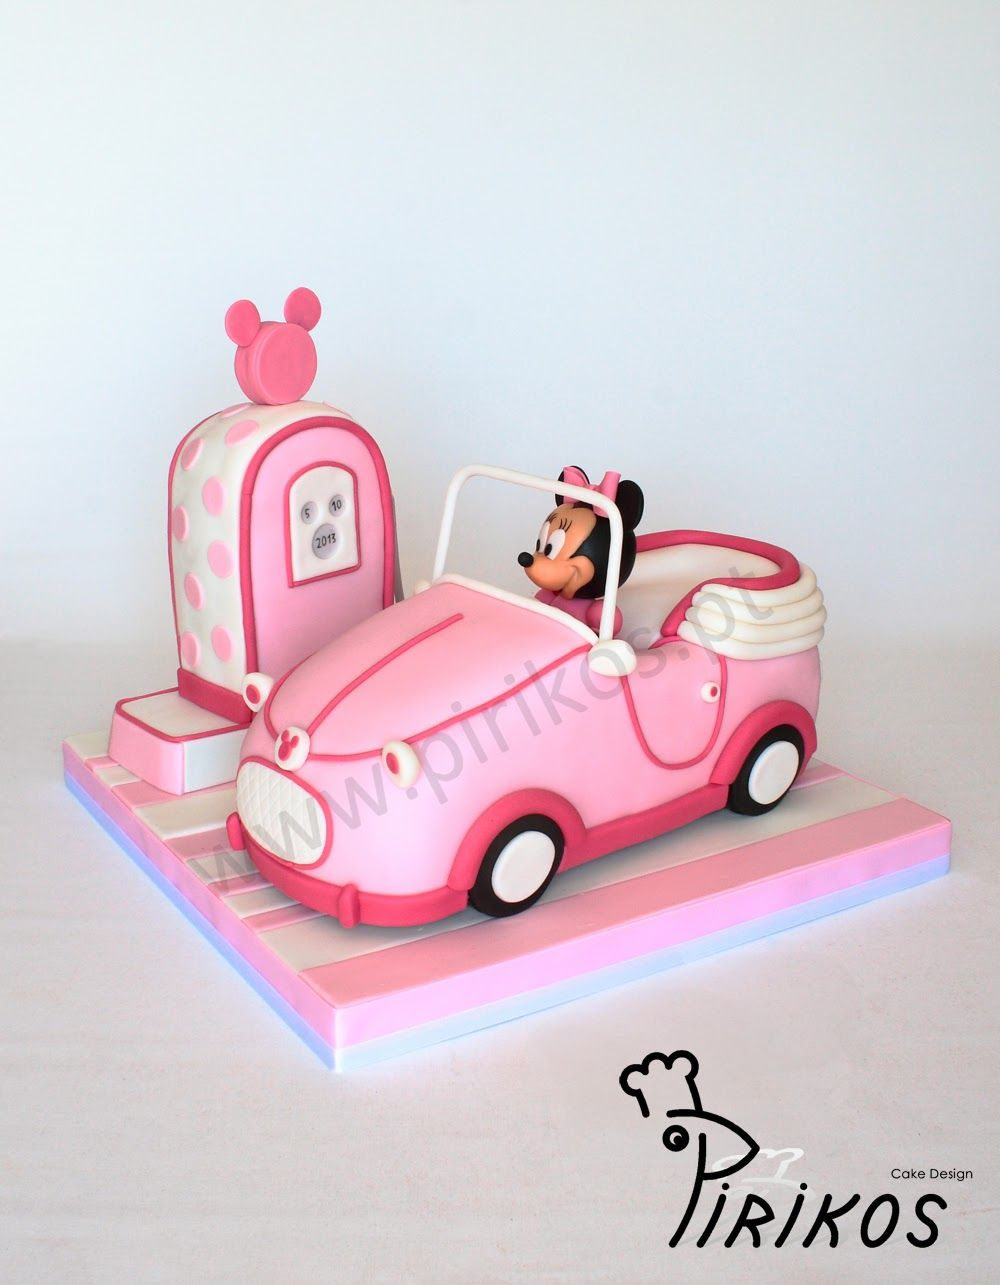 Pirikos Cake Design